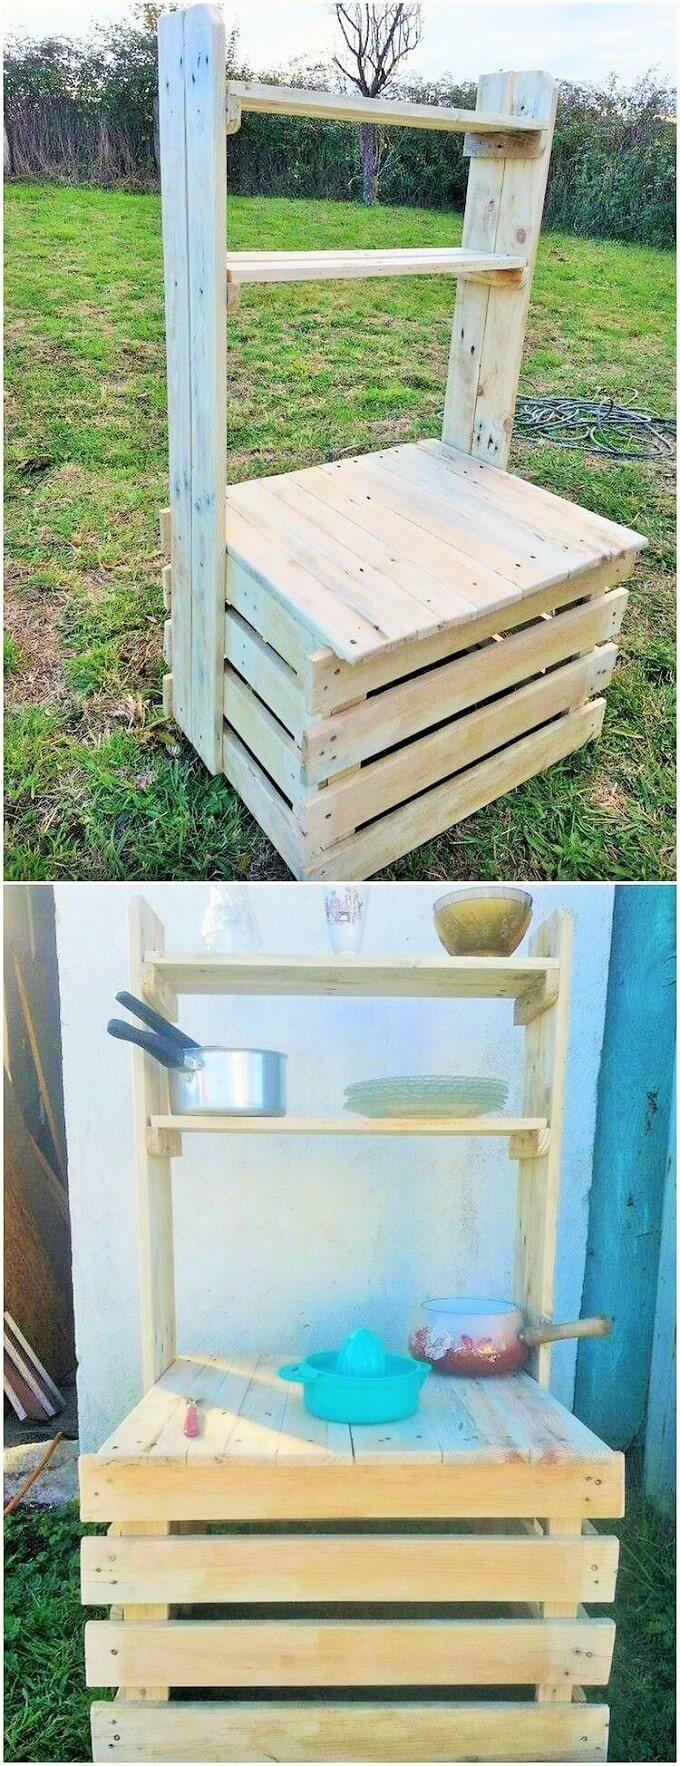 Wooden-Pallet-Creation-ideas1 (2)